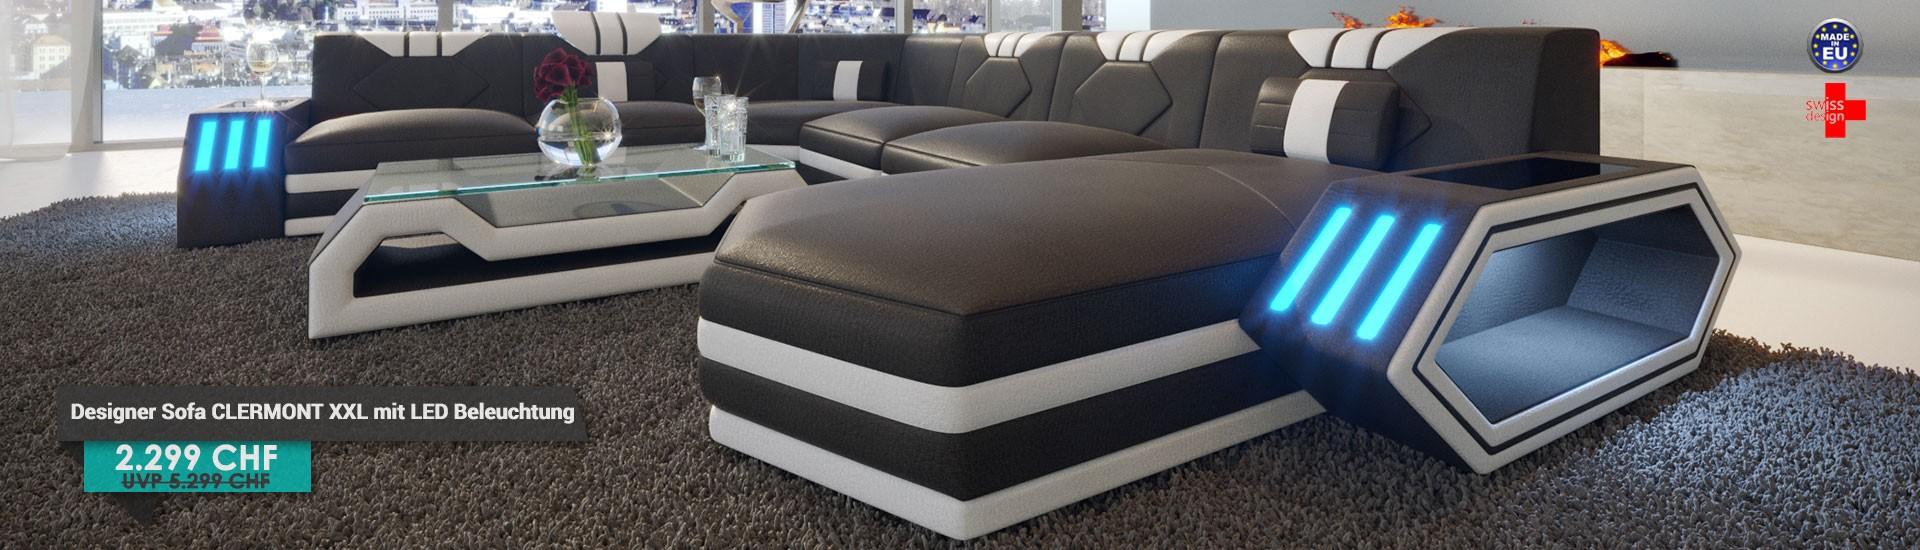 sofa billig kaufen schweiz. Black Bedroom Furniture Sets. Home Design Ideas